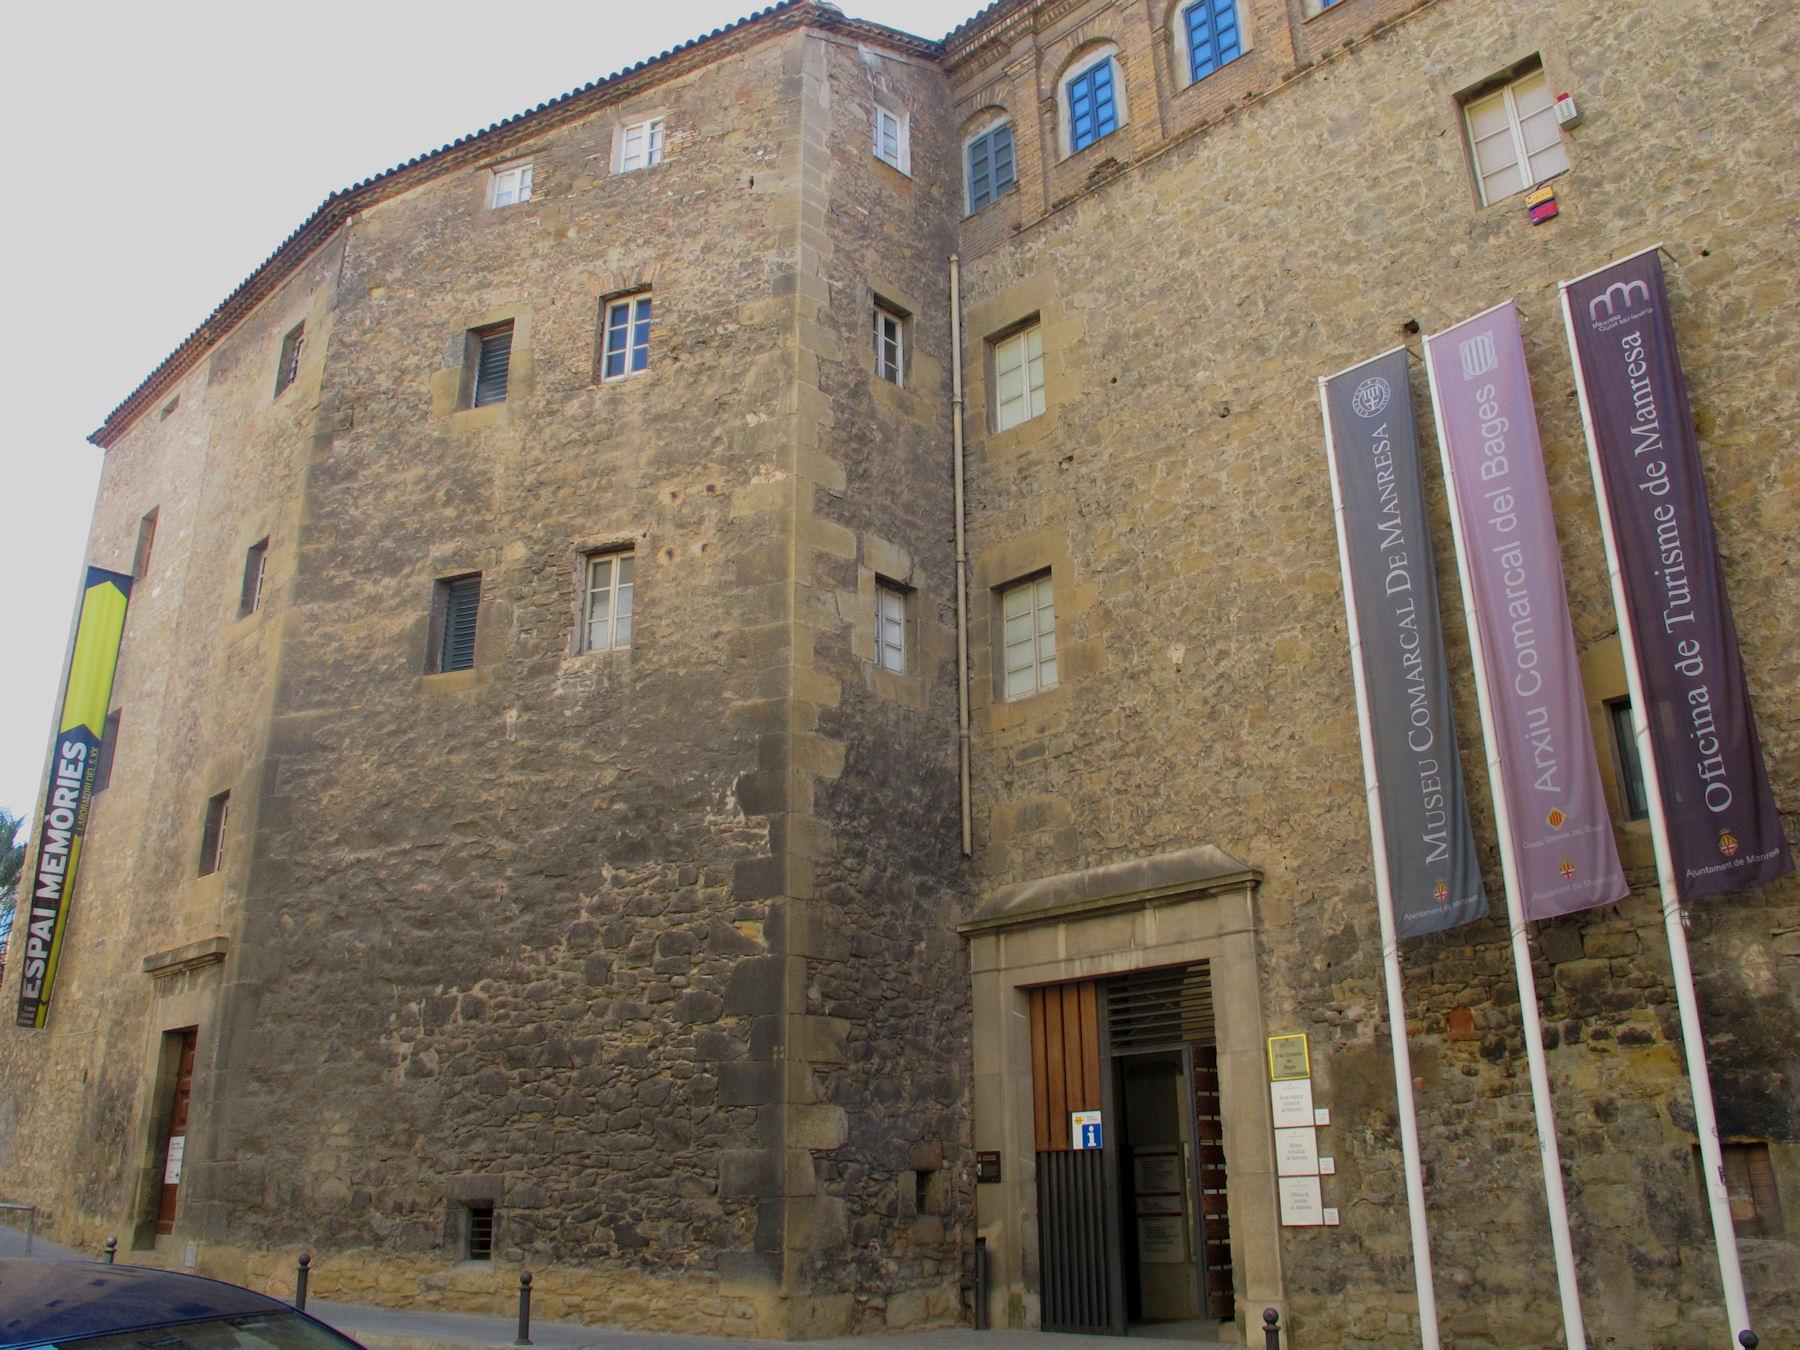 Depiction of Museo Comarcal de Manresa